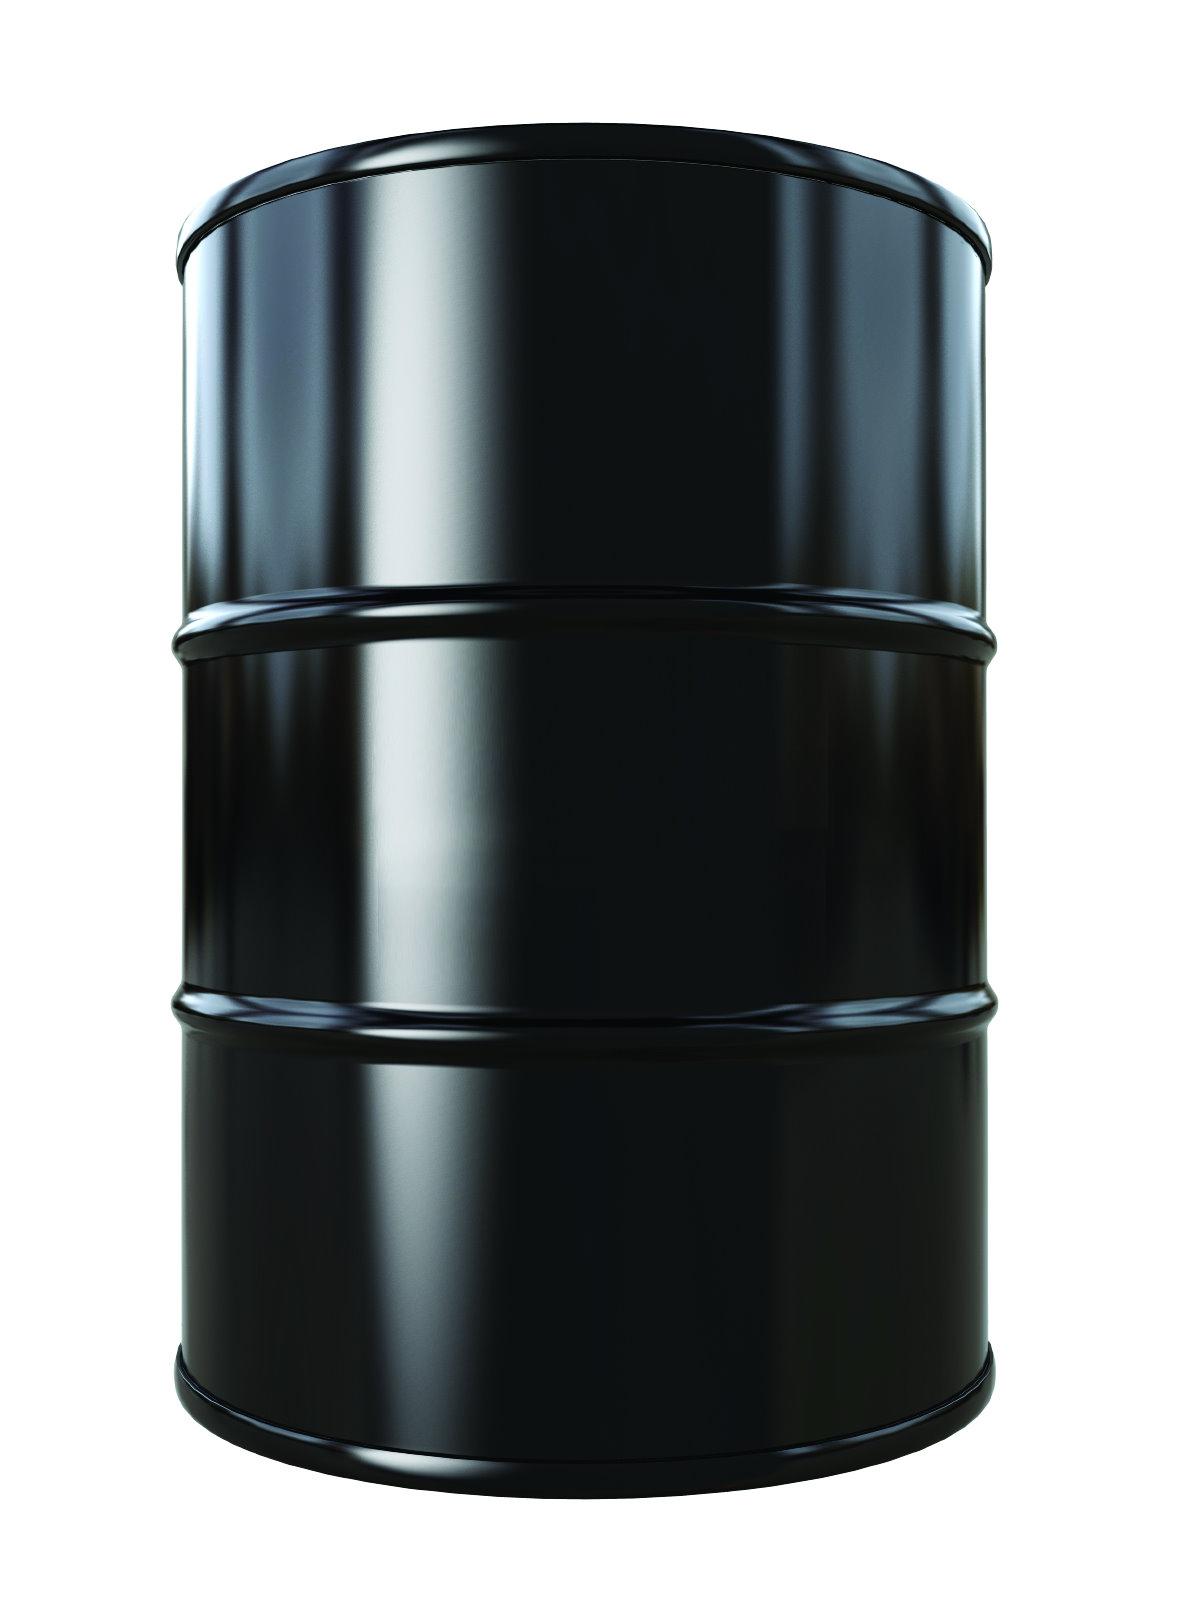 Barrel clipart crude oil Oil  Find high more